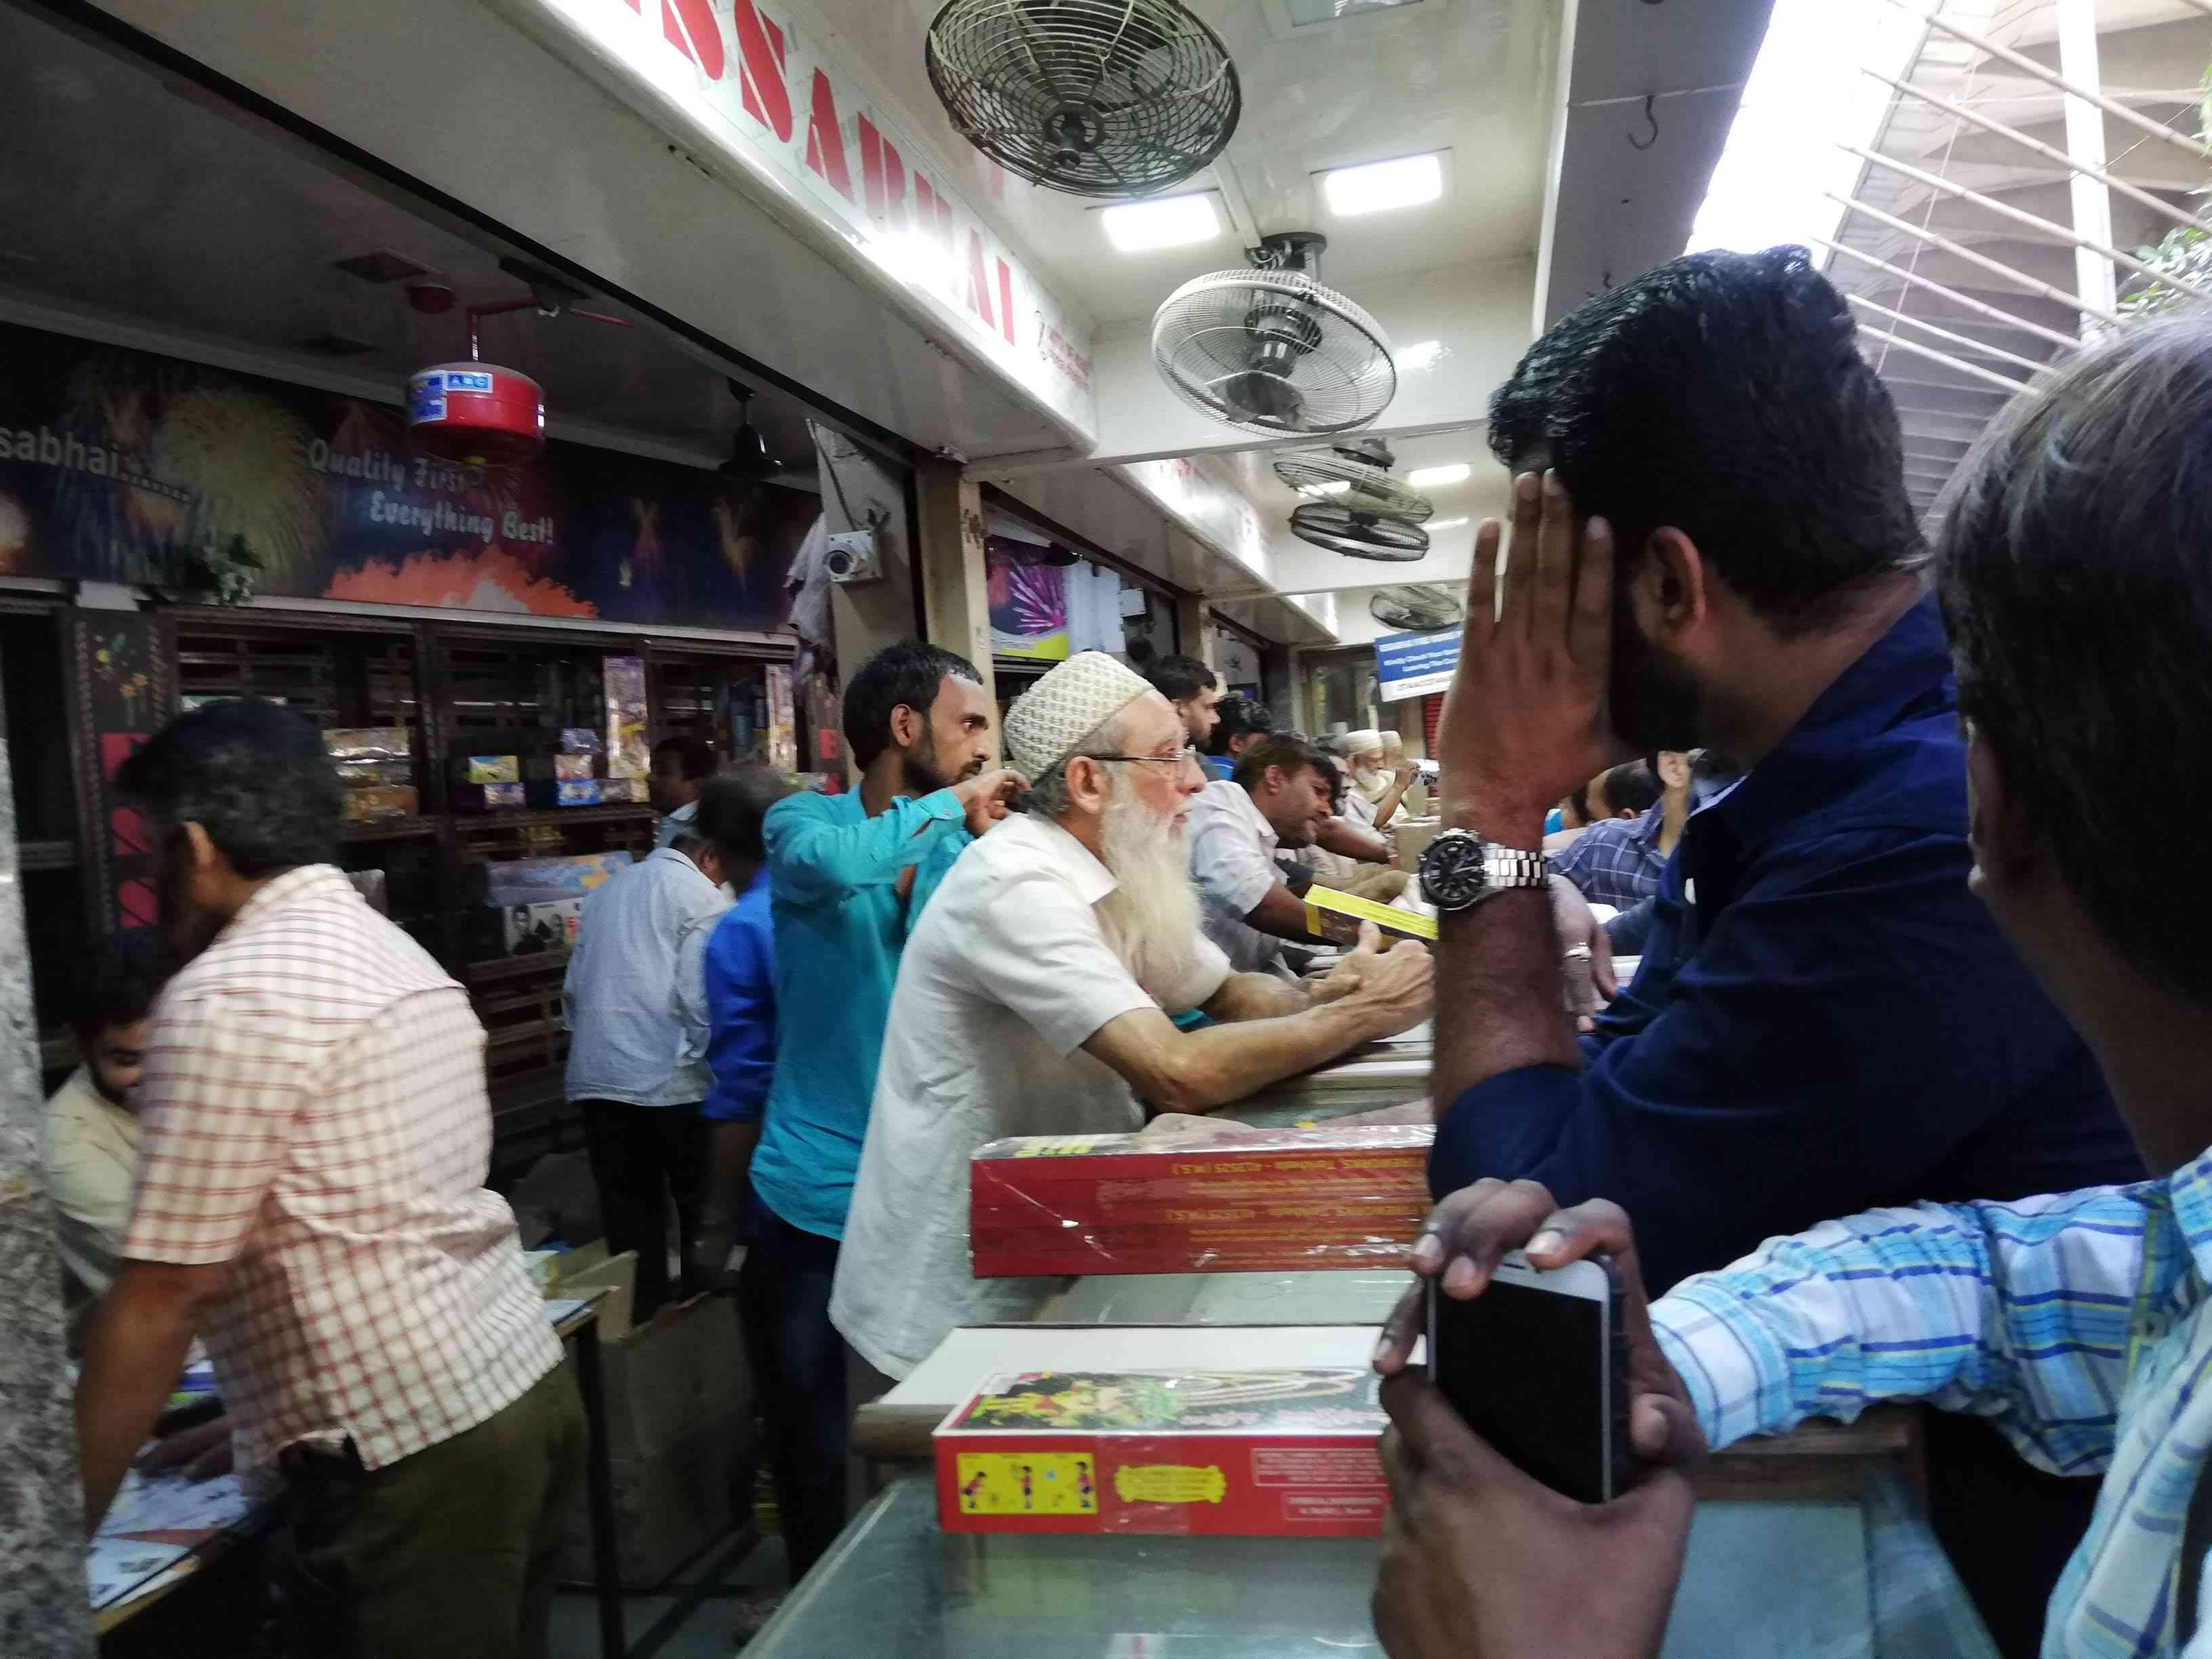 Customers throng Essabhai Fireworks, on Mohammed Ali Road in South Mumbai. (Photo credit: Mridula Chari).